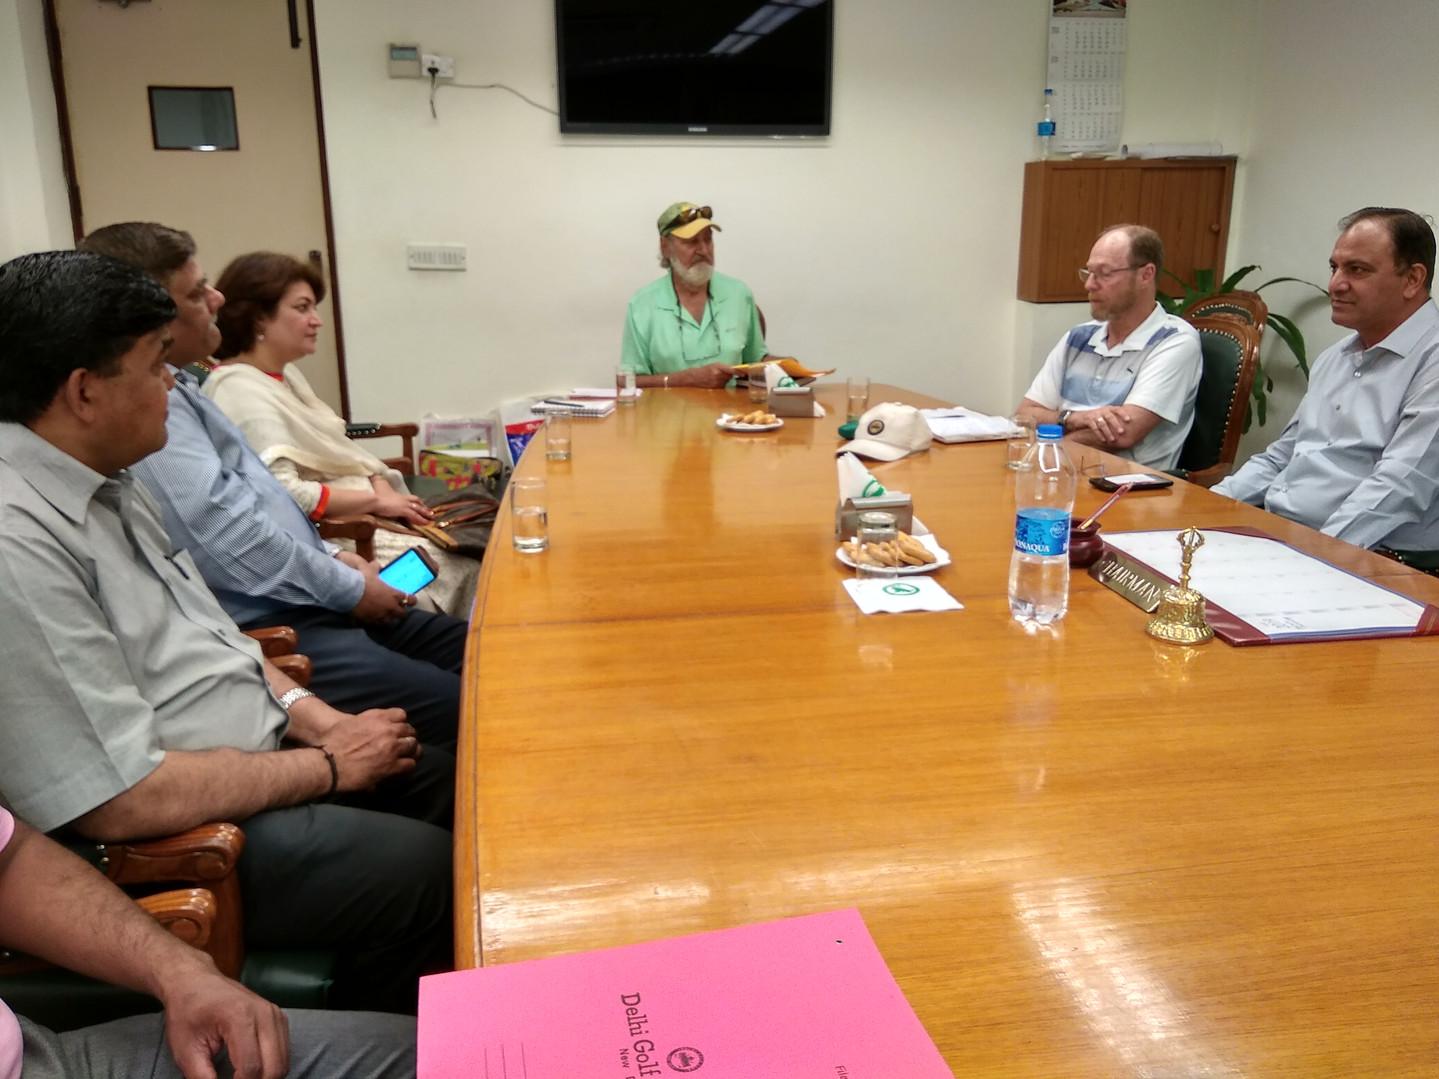 DGC Board Meeting - Dr. Angeli Qwatra, M